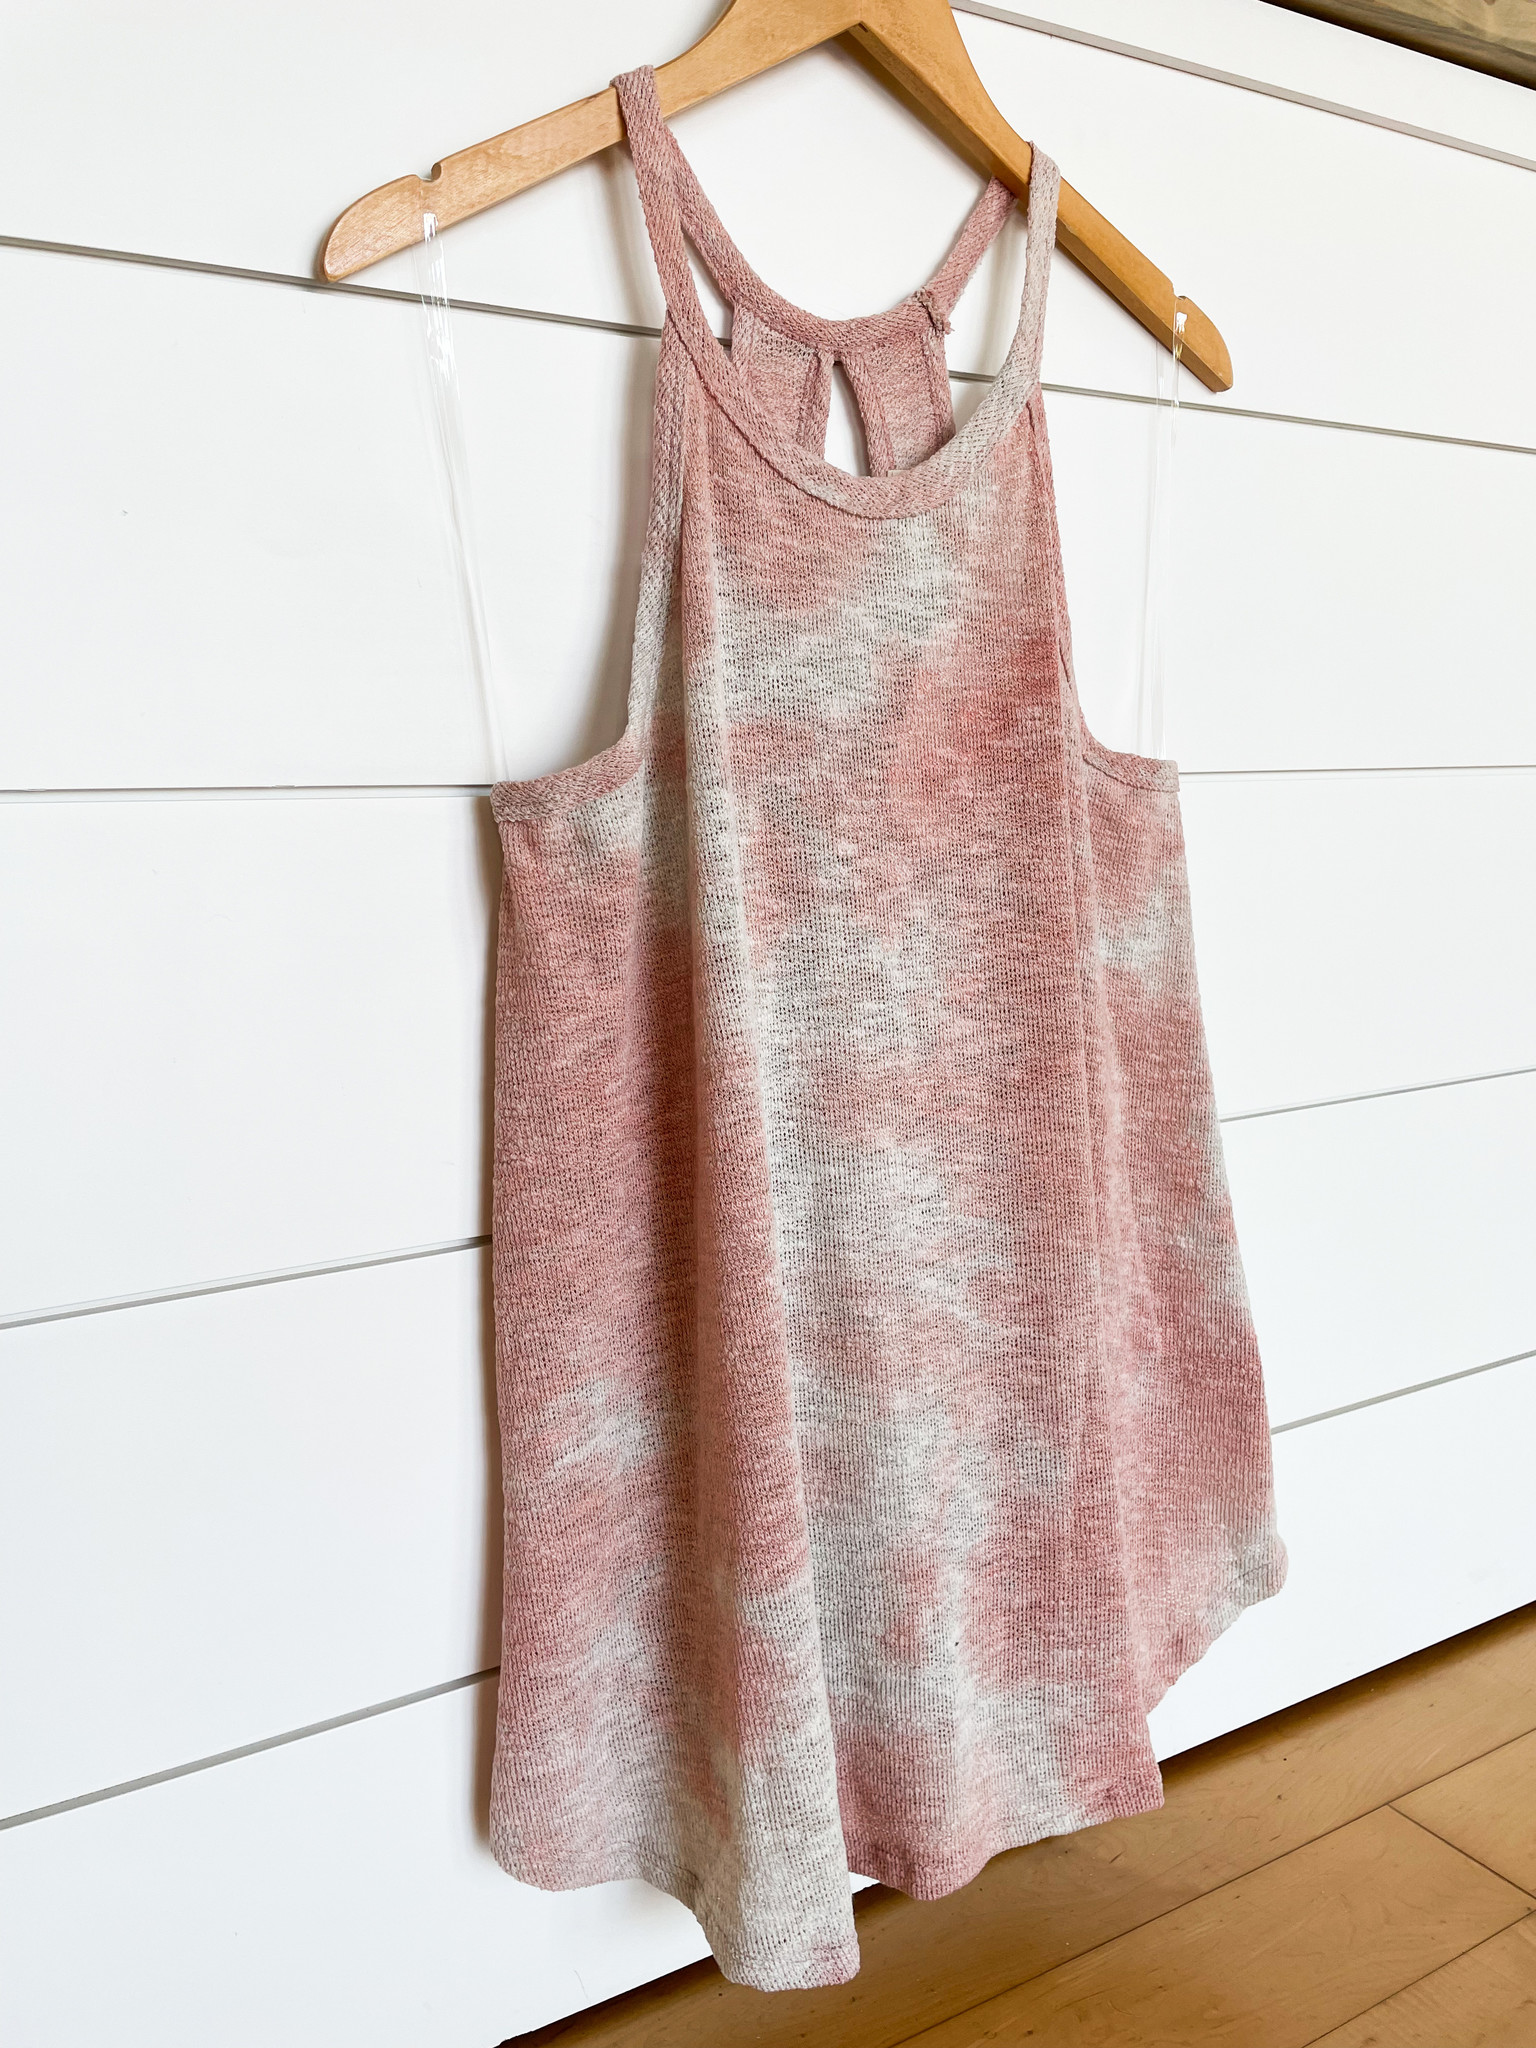 Mauve Tie Dye Open Back Sleeveless Top